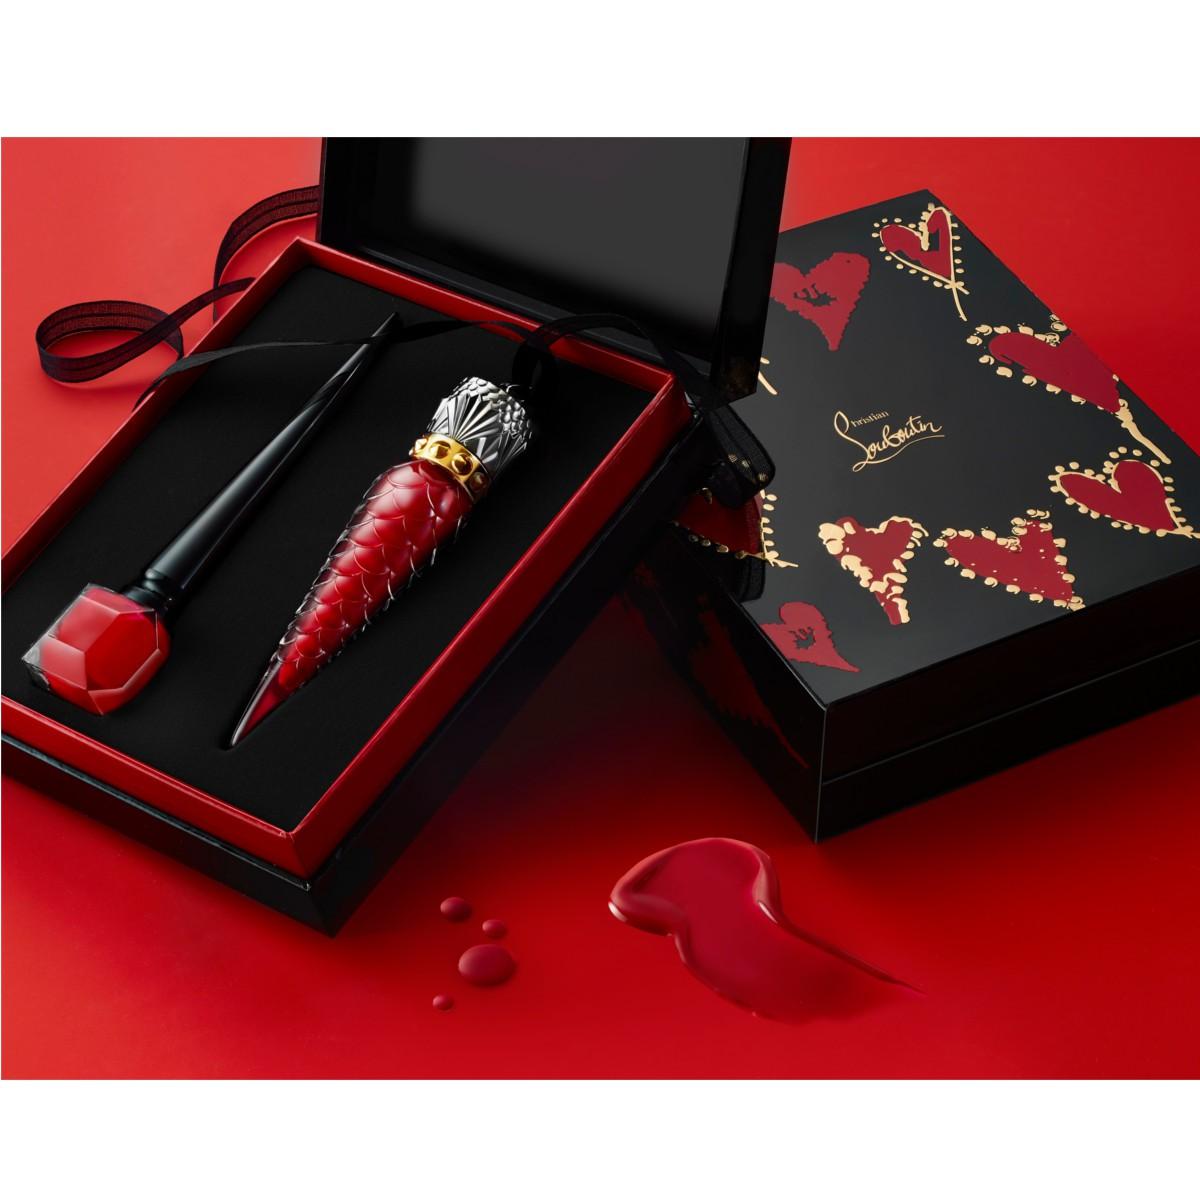 Beauty - Loubivalentine Rouge Louboutin Gift Box - Christian Louboutin